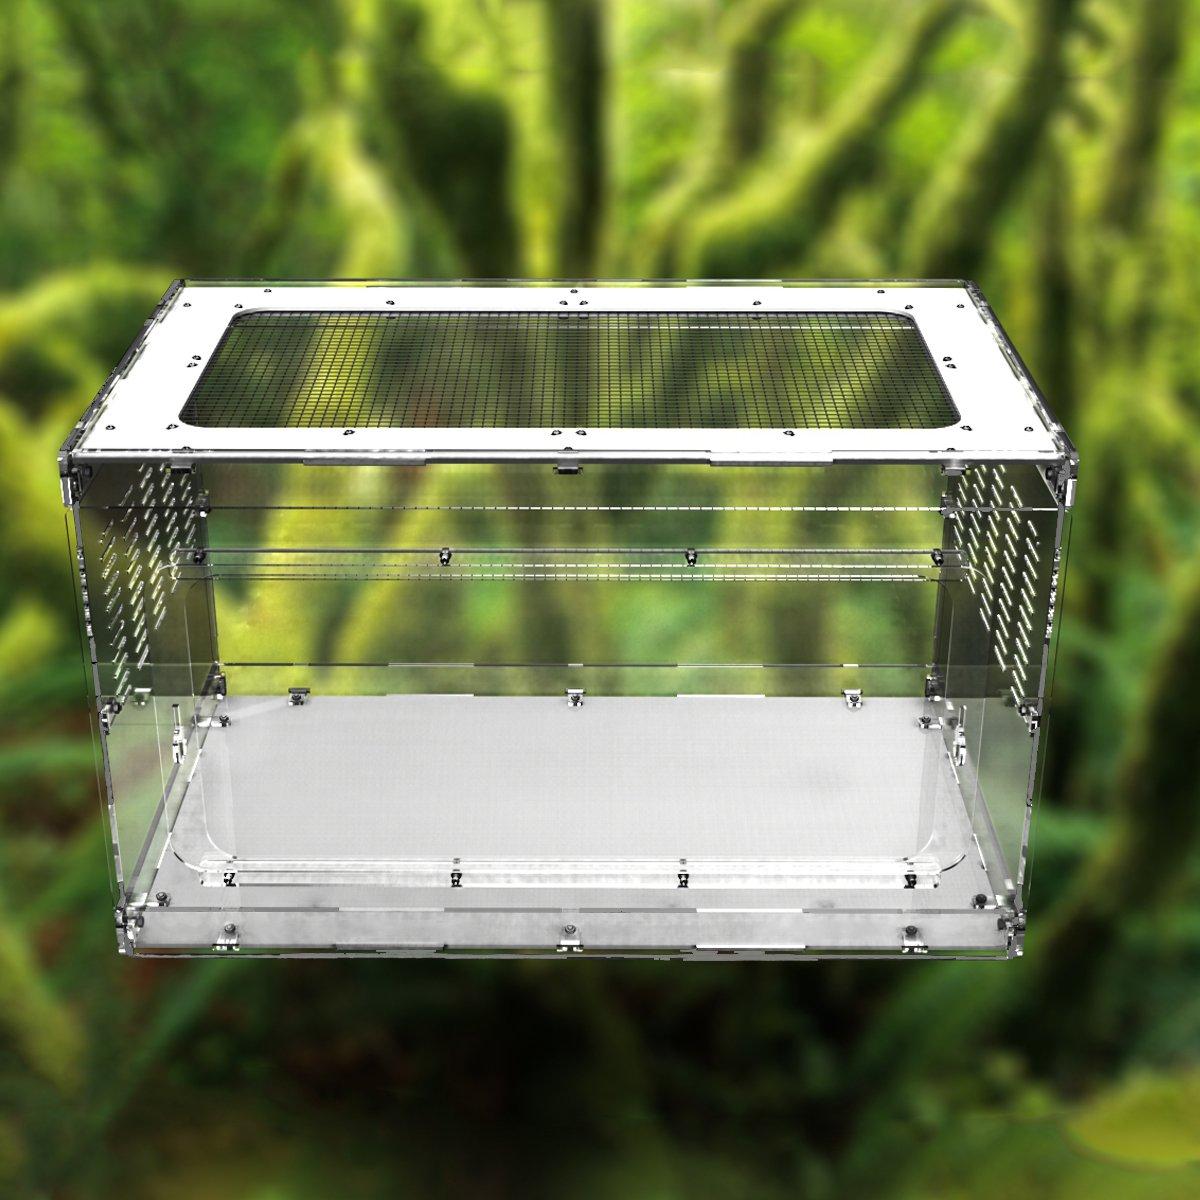 Dalle Craft Acrylic Reptile Terrarium Habitat for Arboreal Tarantulas Chameleon Green Anole or Other Reptiles (20x12x12 inches)